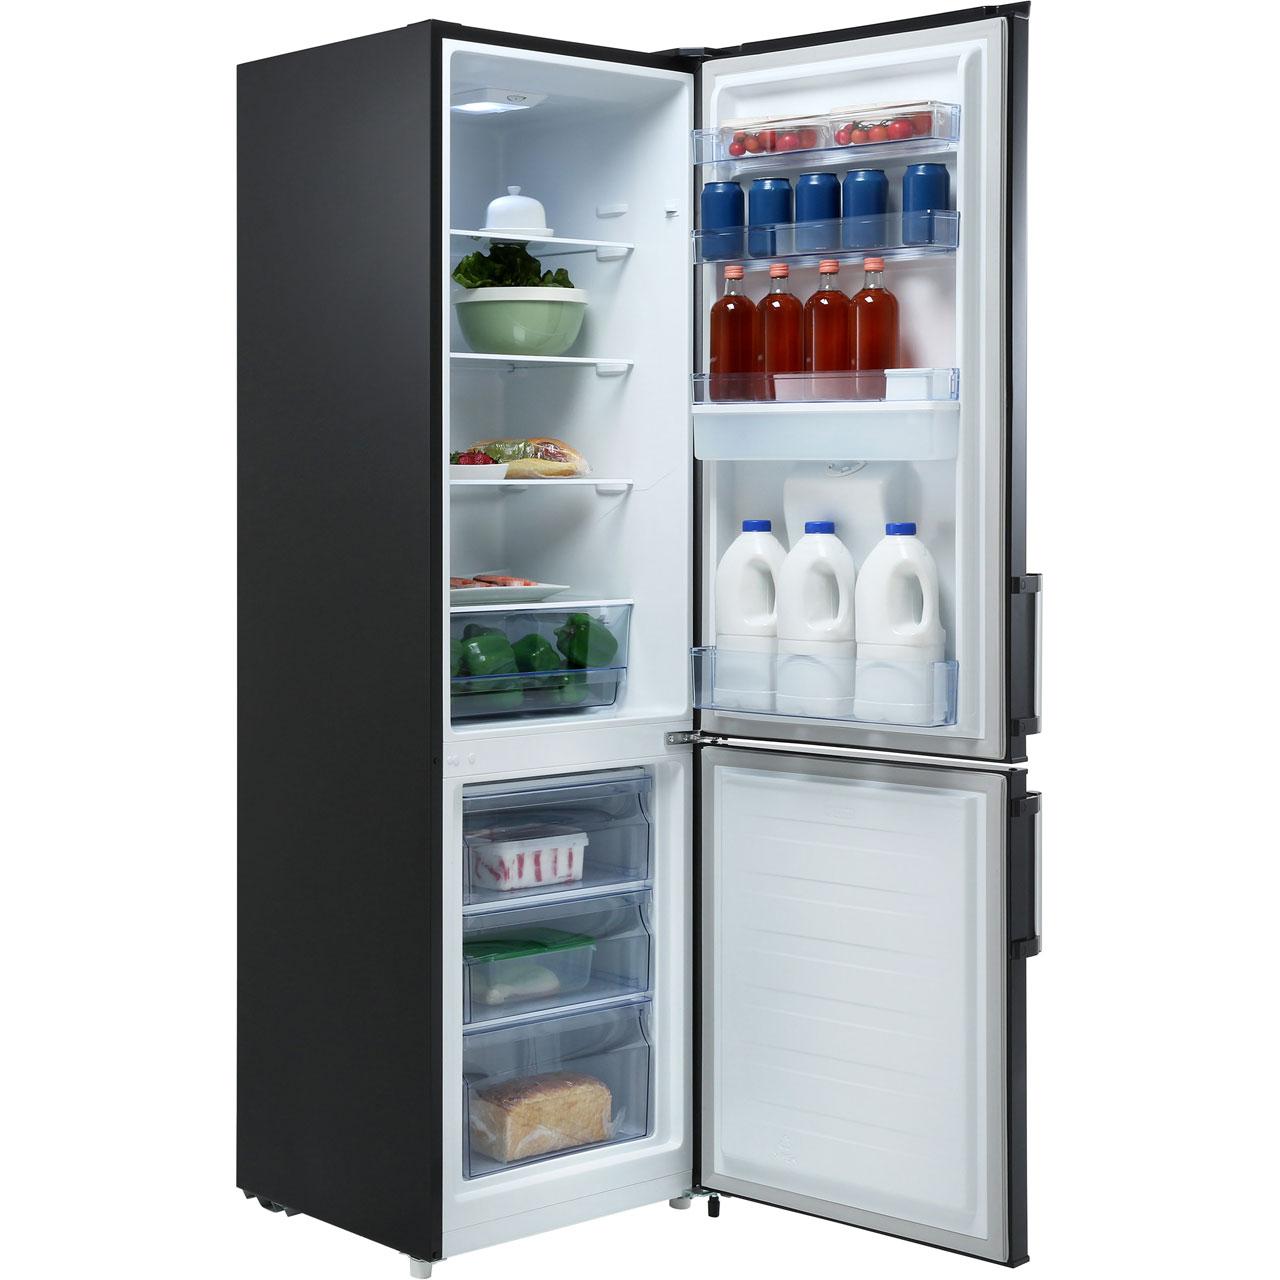 Ranges & Cooking Appliances Freezer Hinge Set Genuine Zanussi Fridge